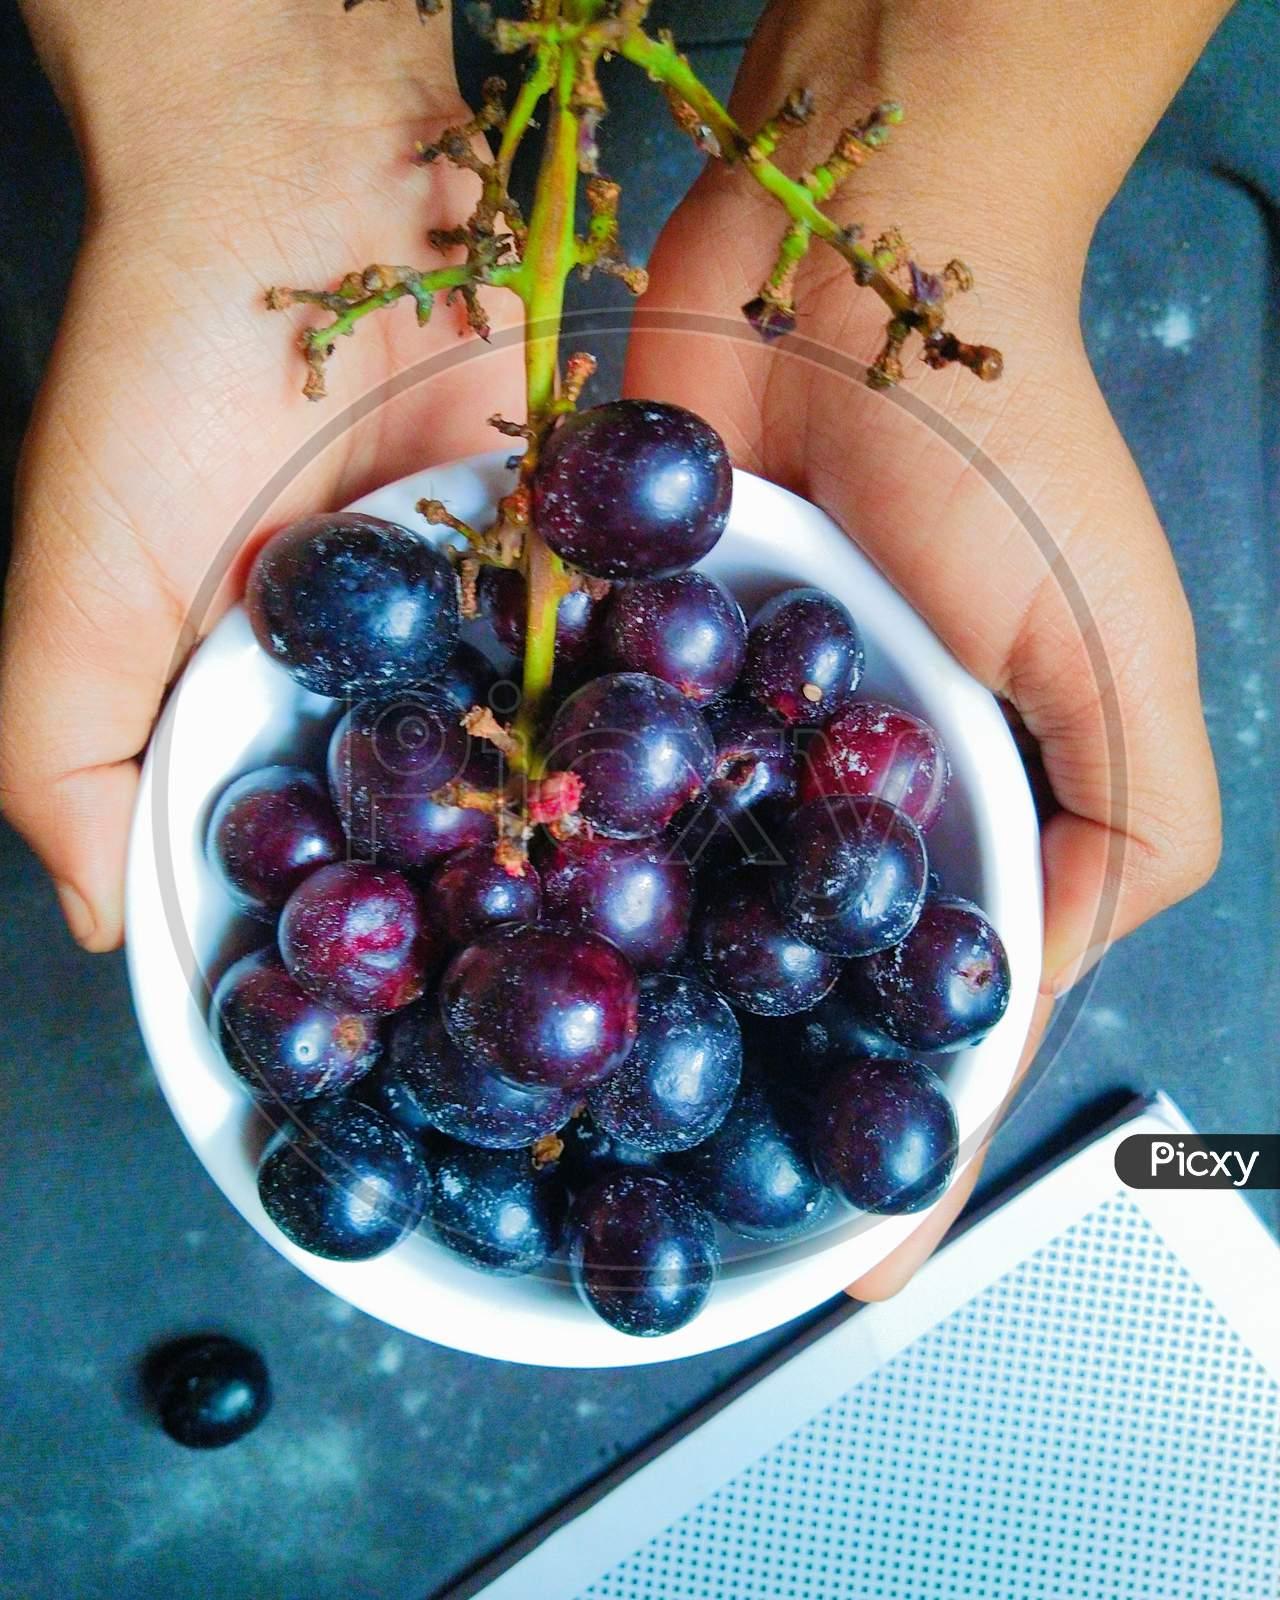 A bowl of fresh black  grapes.